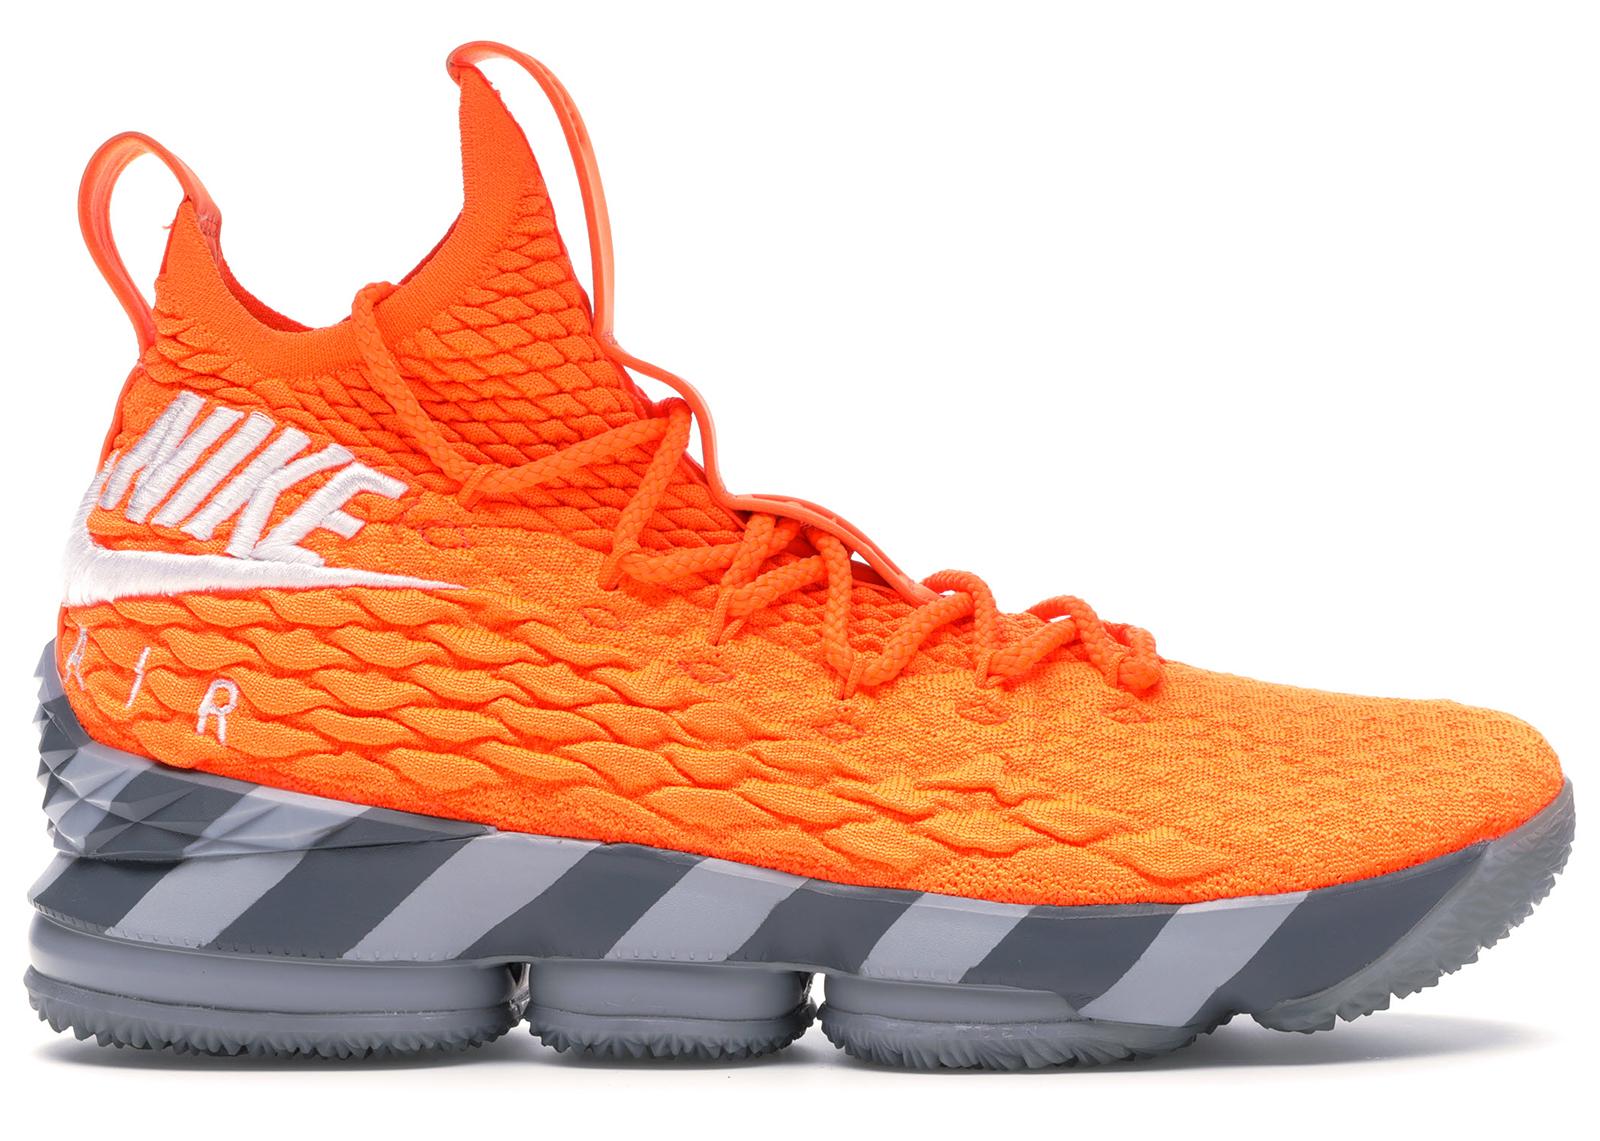 Nike LeBron 15 Orange Box - AR5125-800